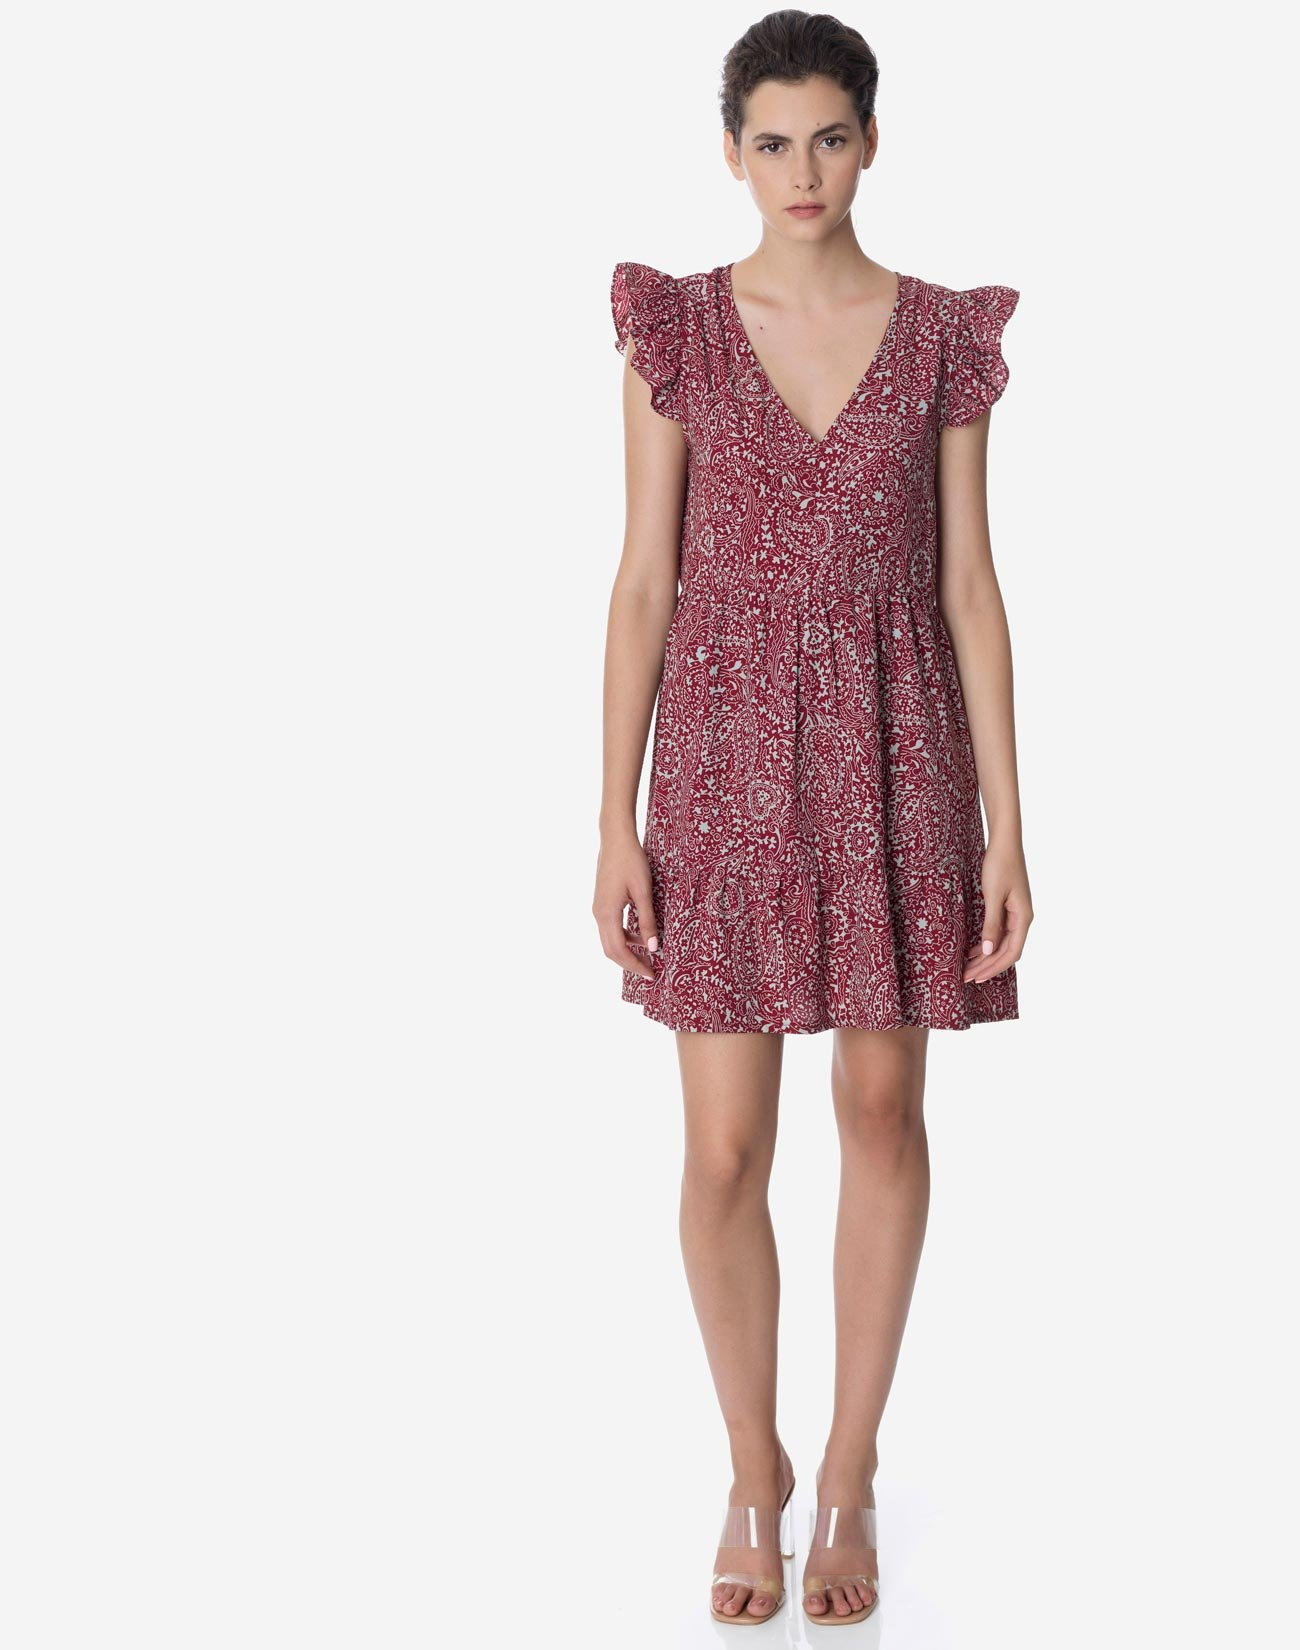 Mini printed dress with ruffles